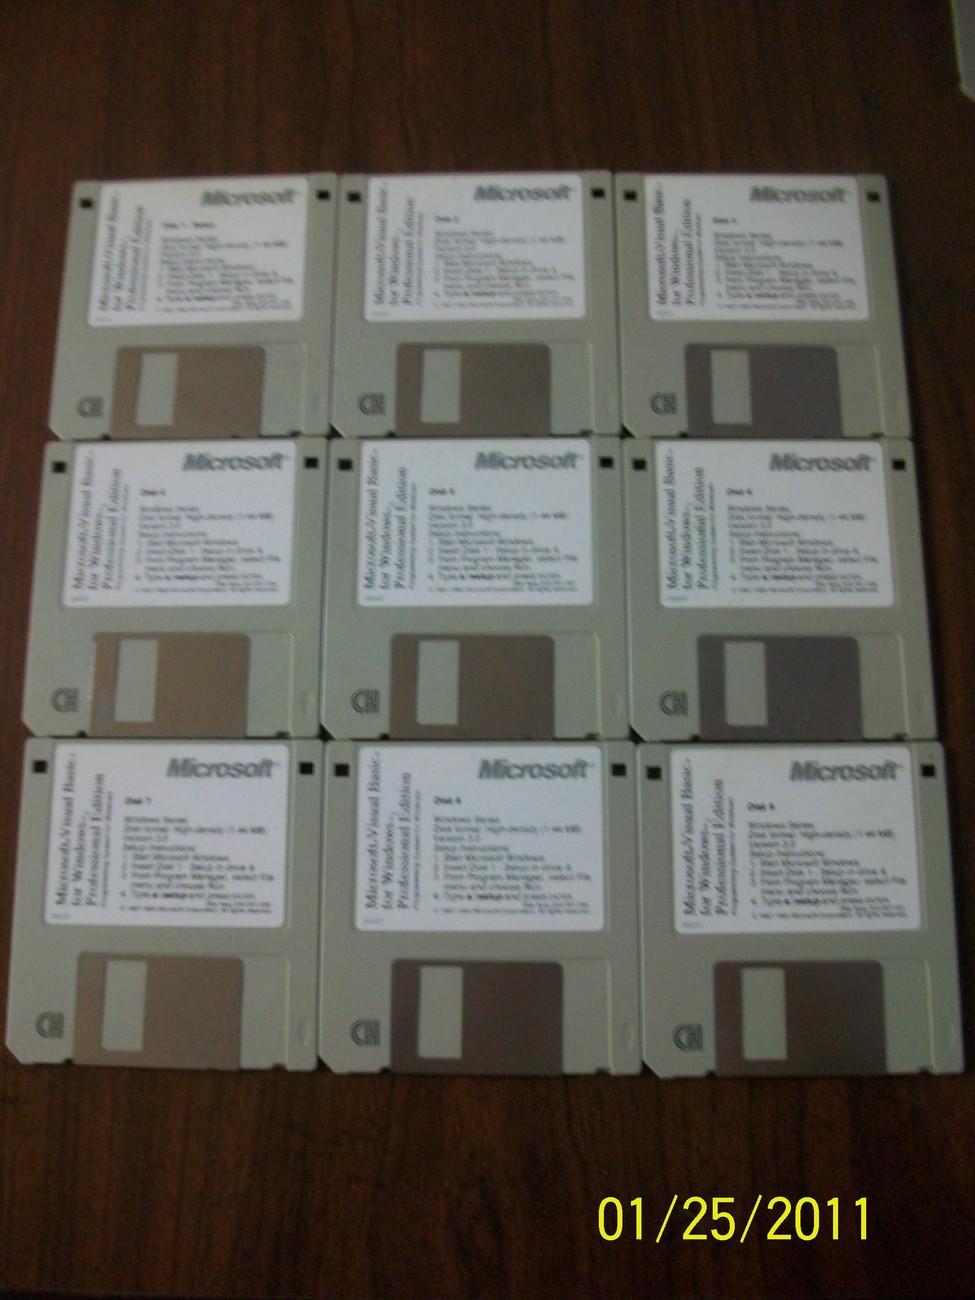 Microsoft Visual Basic for Windows Professional Edition, 9 floppy disks